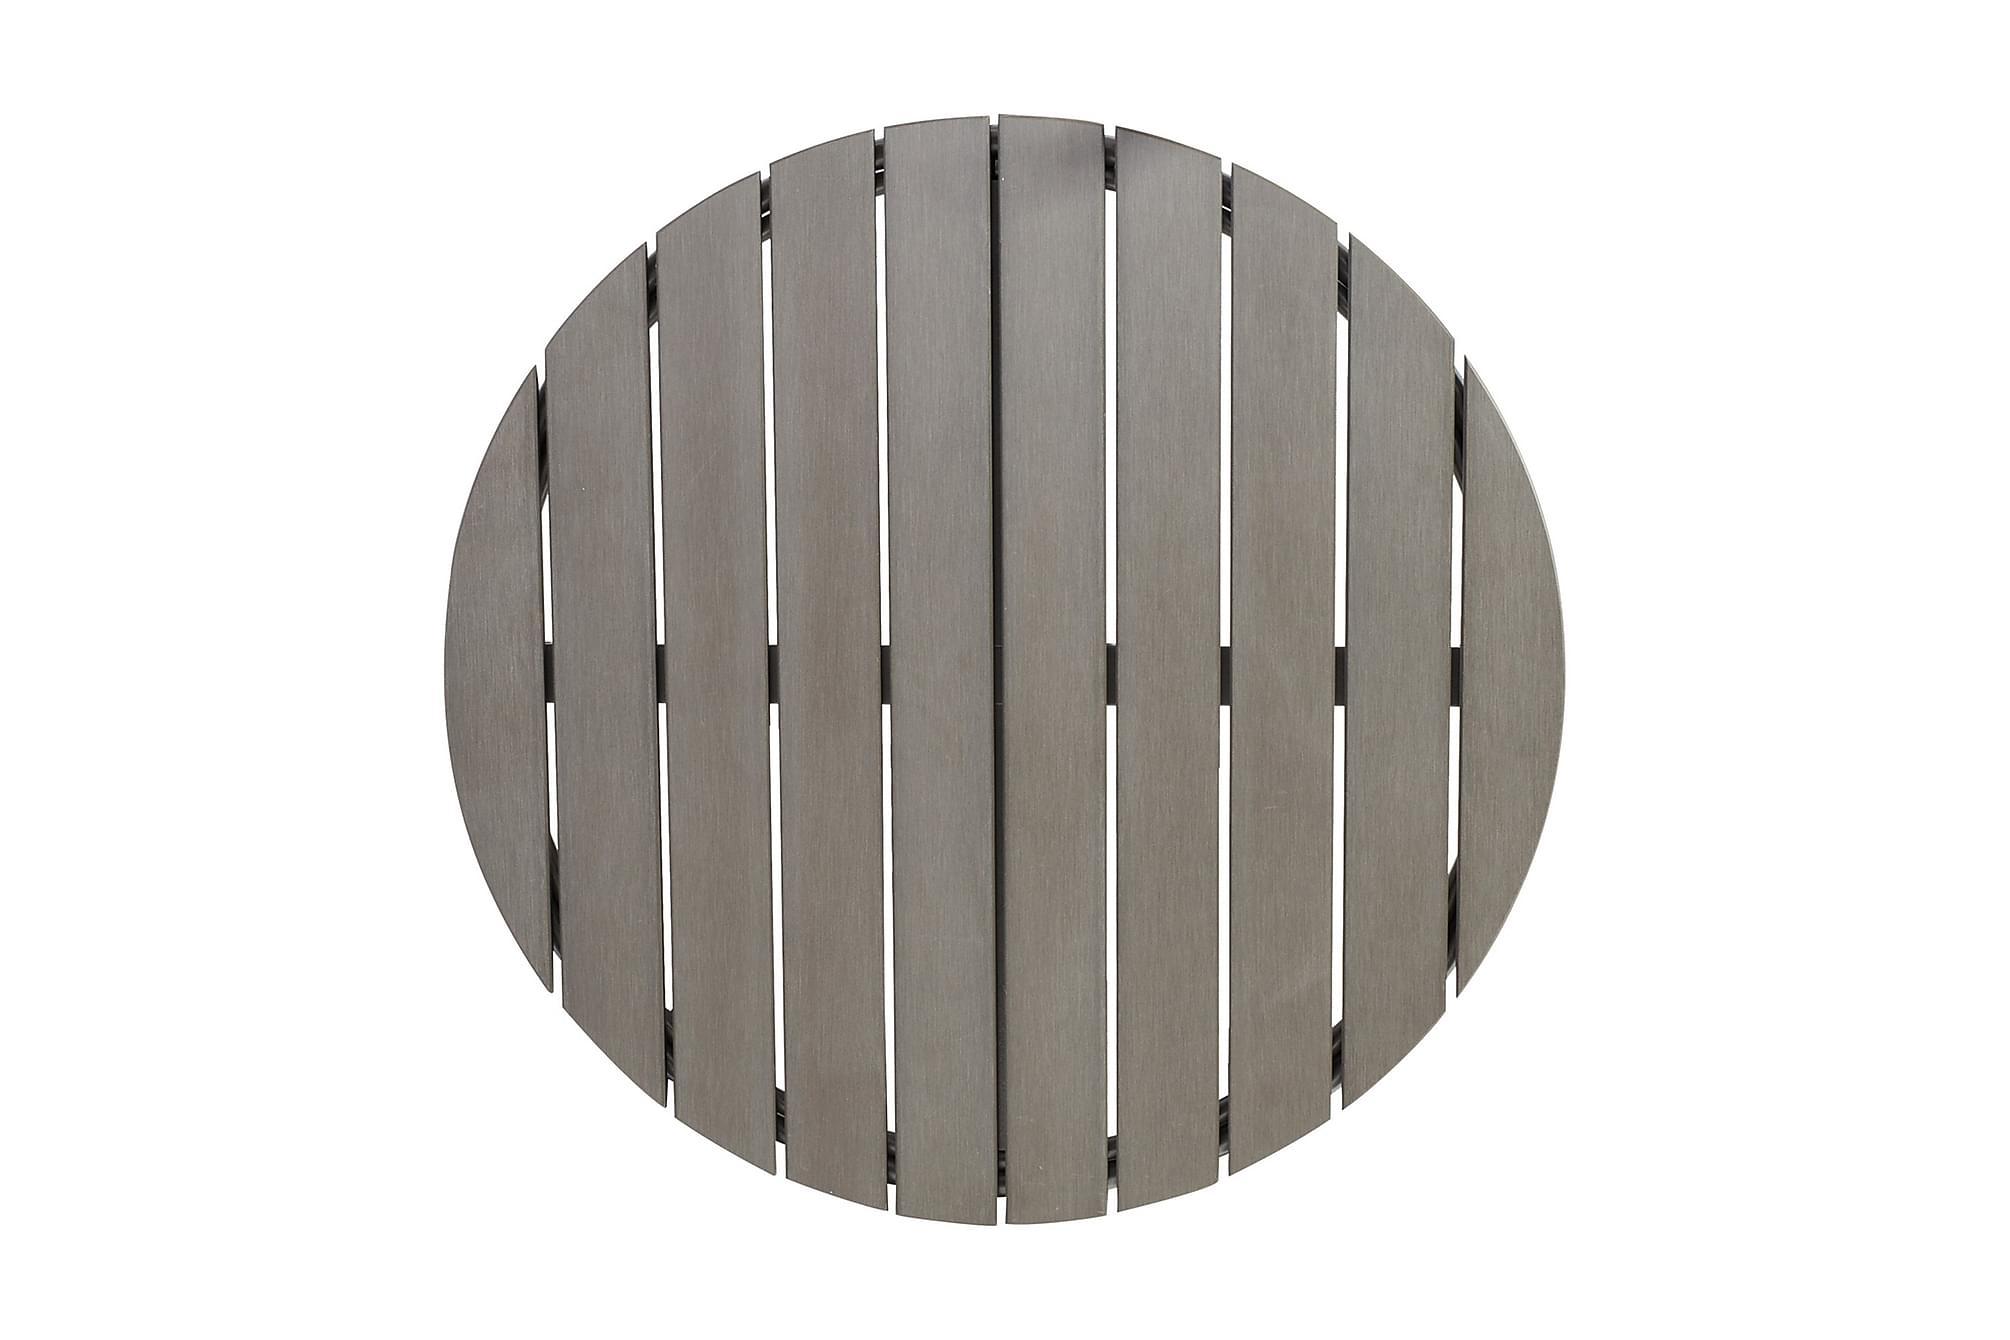 Bordsskiva LARACHE D70cm polywood grå, Matbord